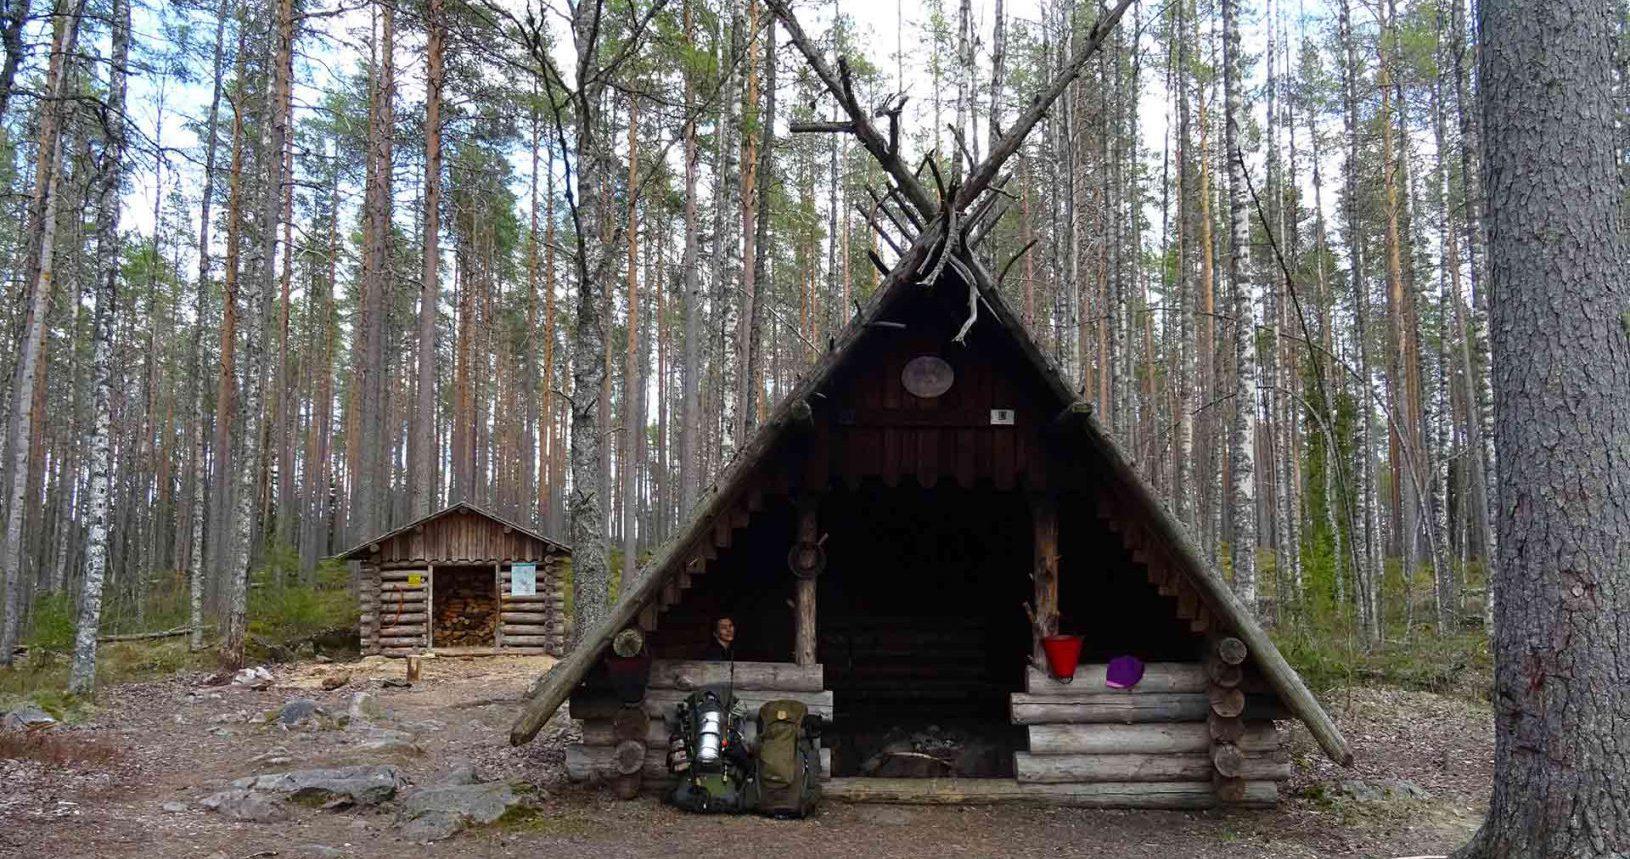 a qoman sitting inside of a wilderness hut in finnish national park